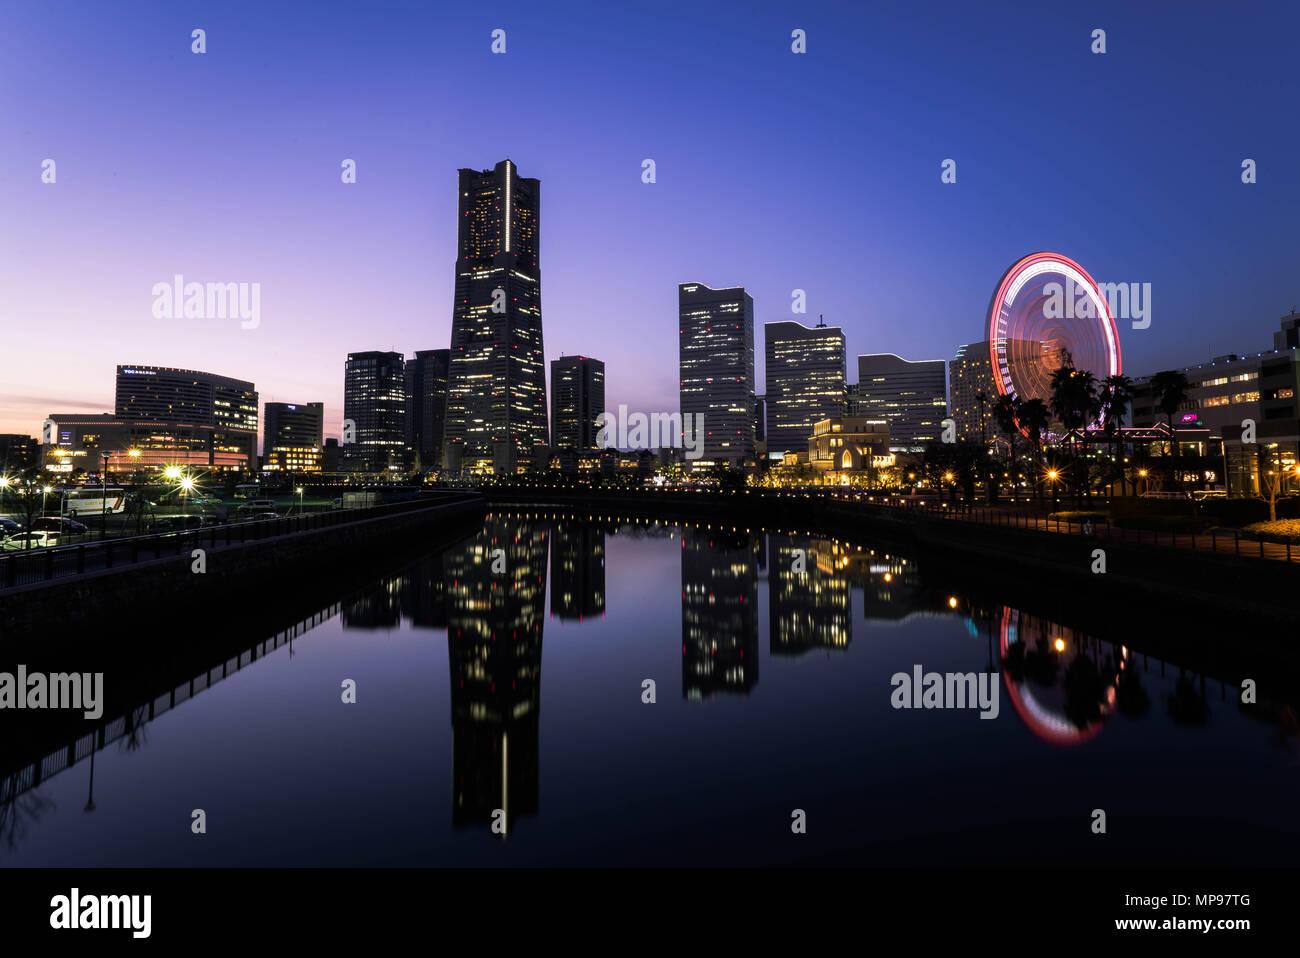 Cityscape of Yokohama MinatoMirai in Yokohama City, Kanagawa Prefecture, Japan. - Stock Image